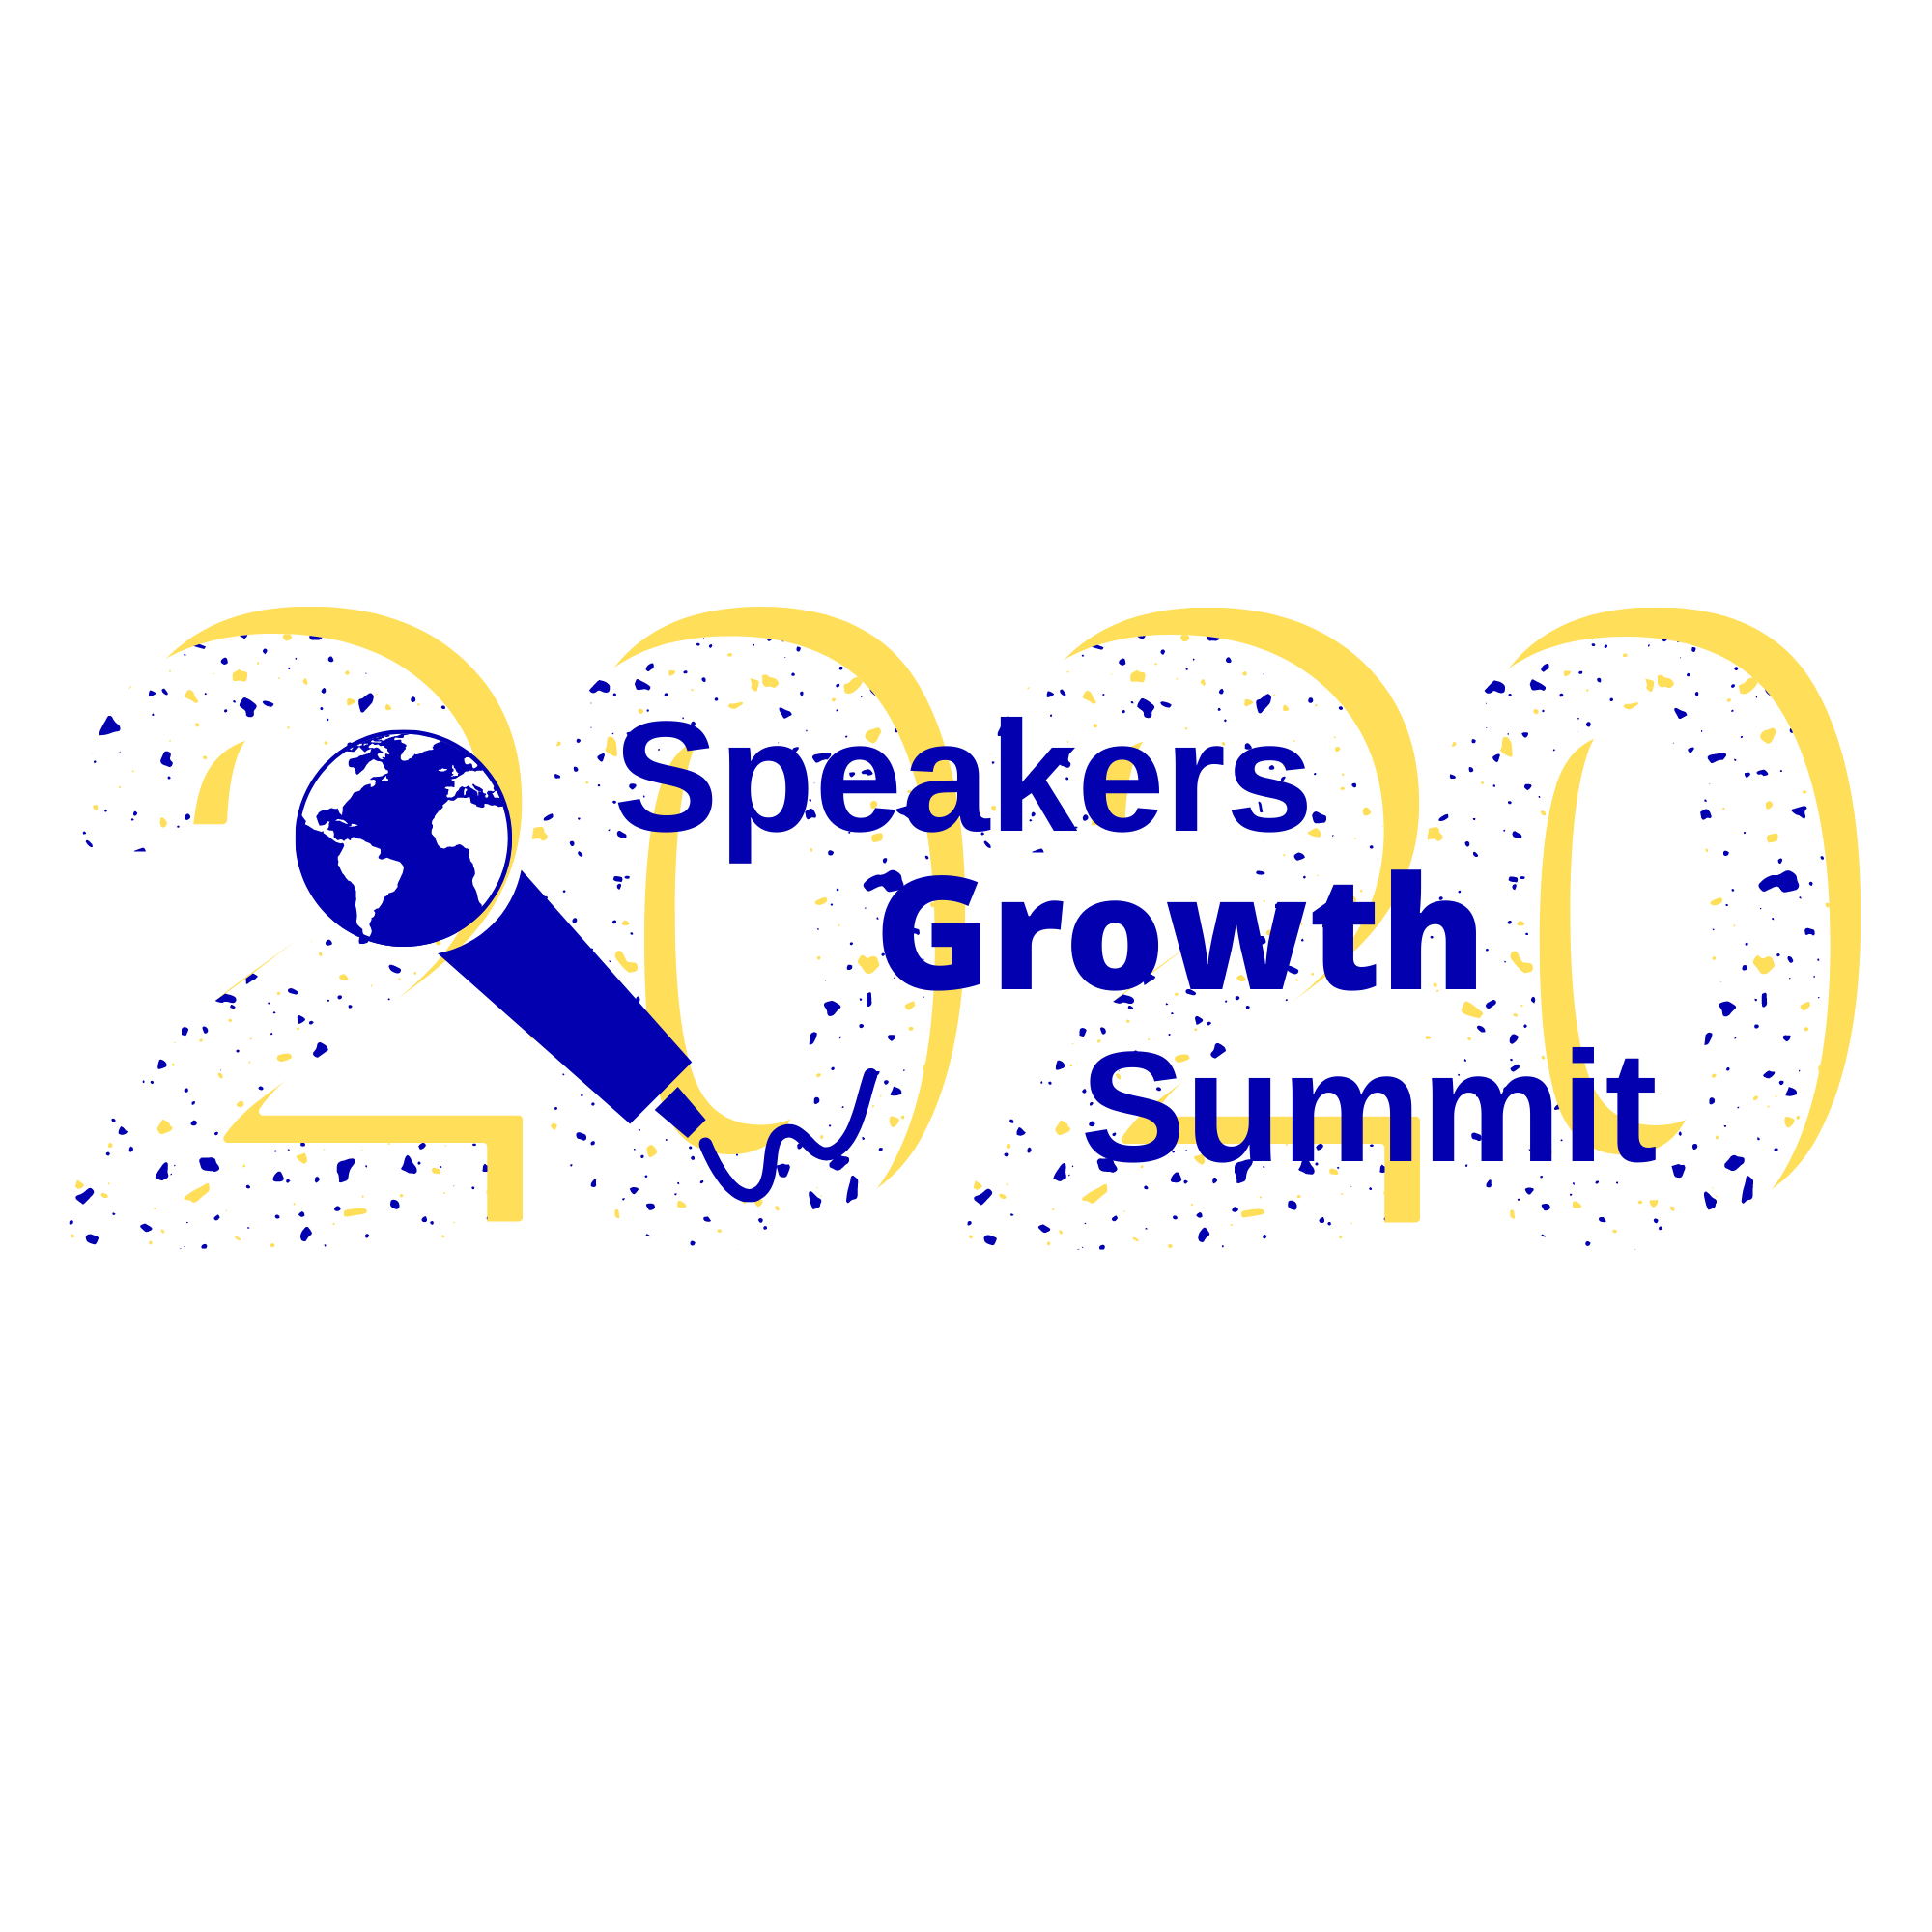 Bizniversity® Announces 2020 Virtual Speakers Growth Summit